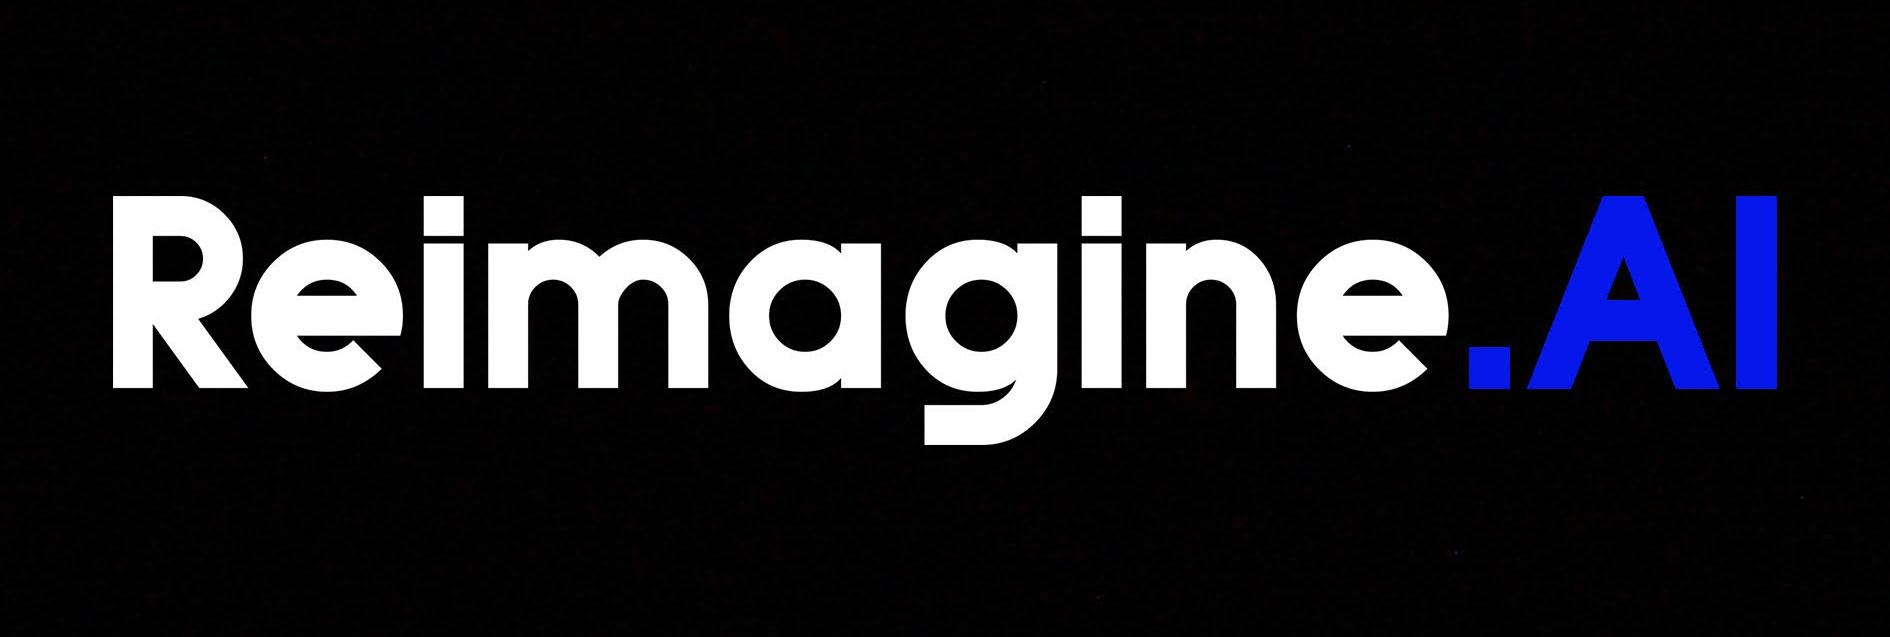 Reimagine AI Logo.jpg